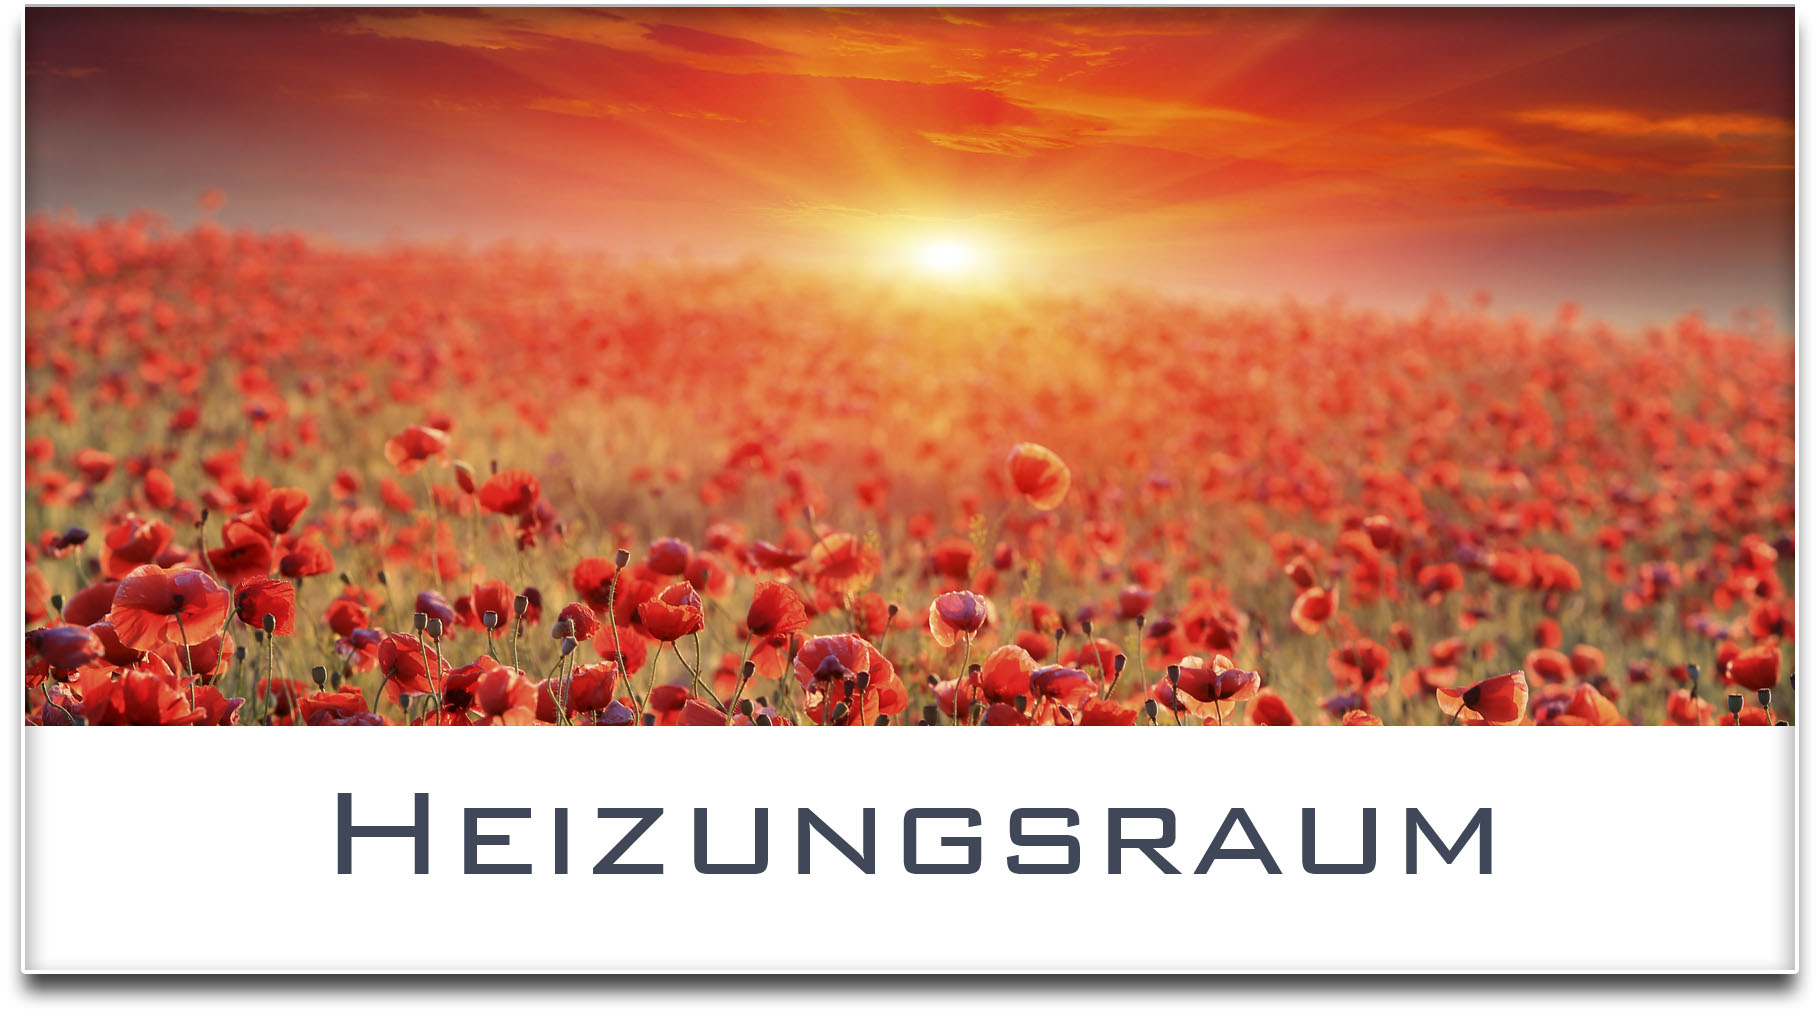 Türschild / Mohnfeld / Sonnenuntergang / Heizungsraum / Selbstklebend